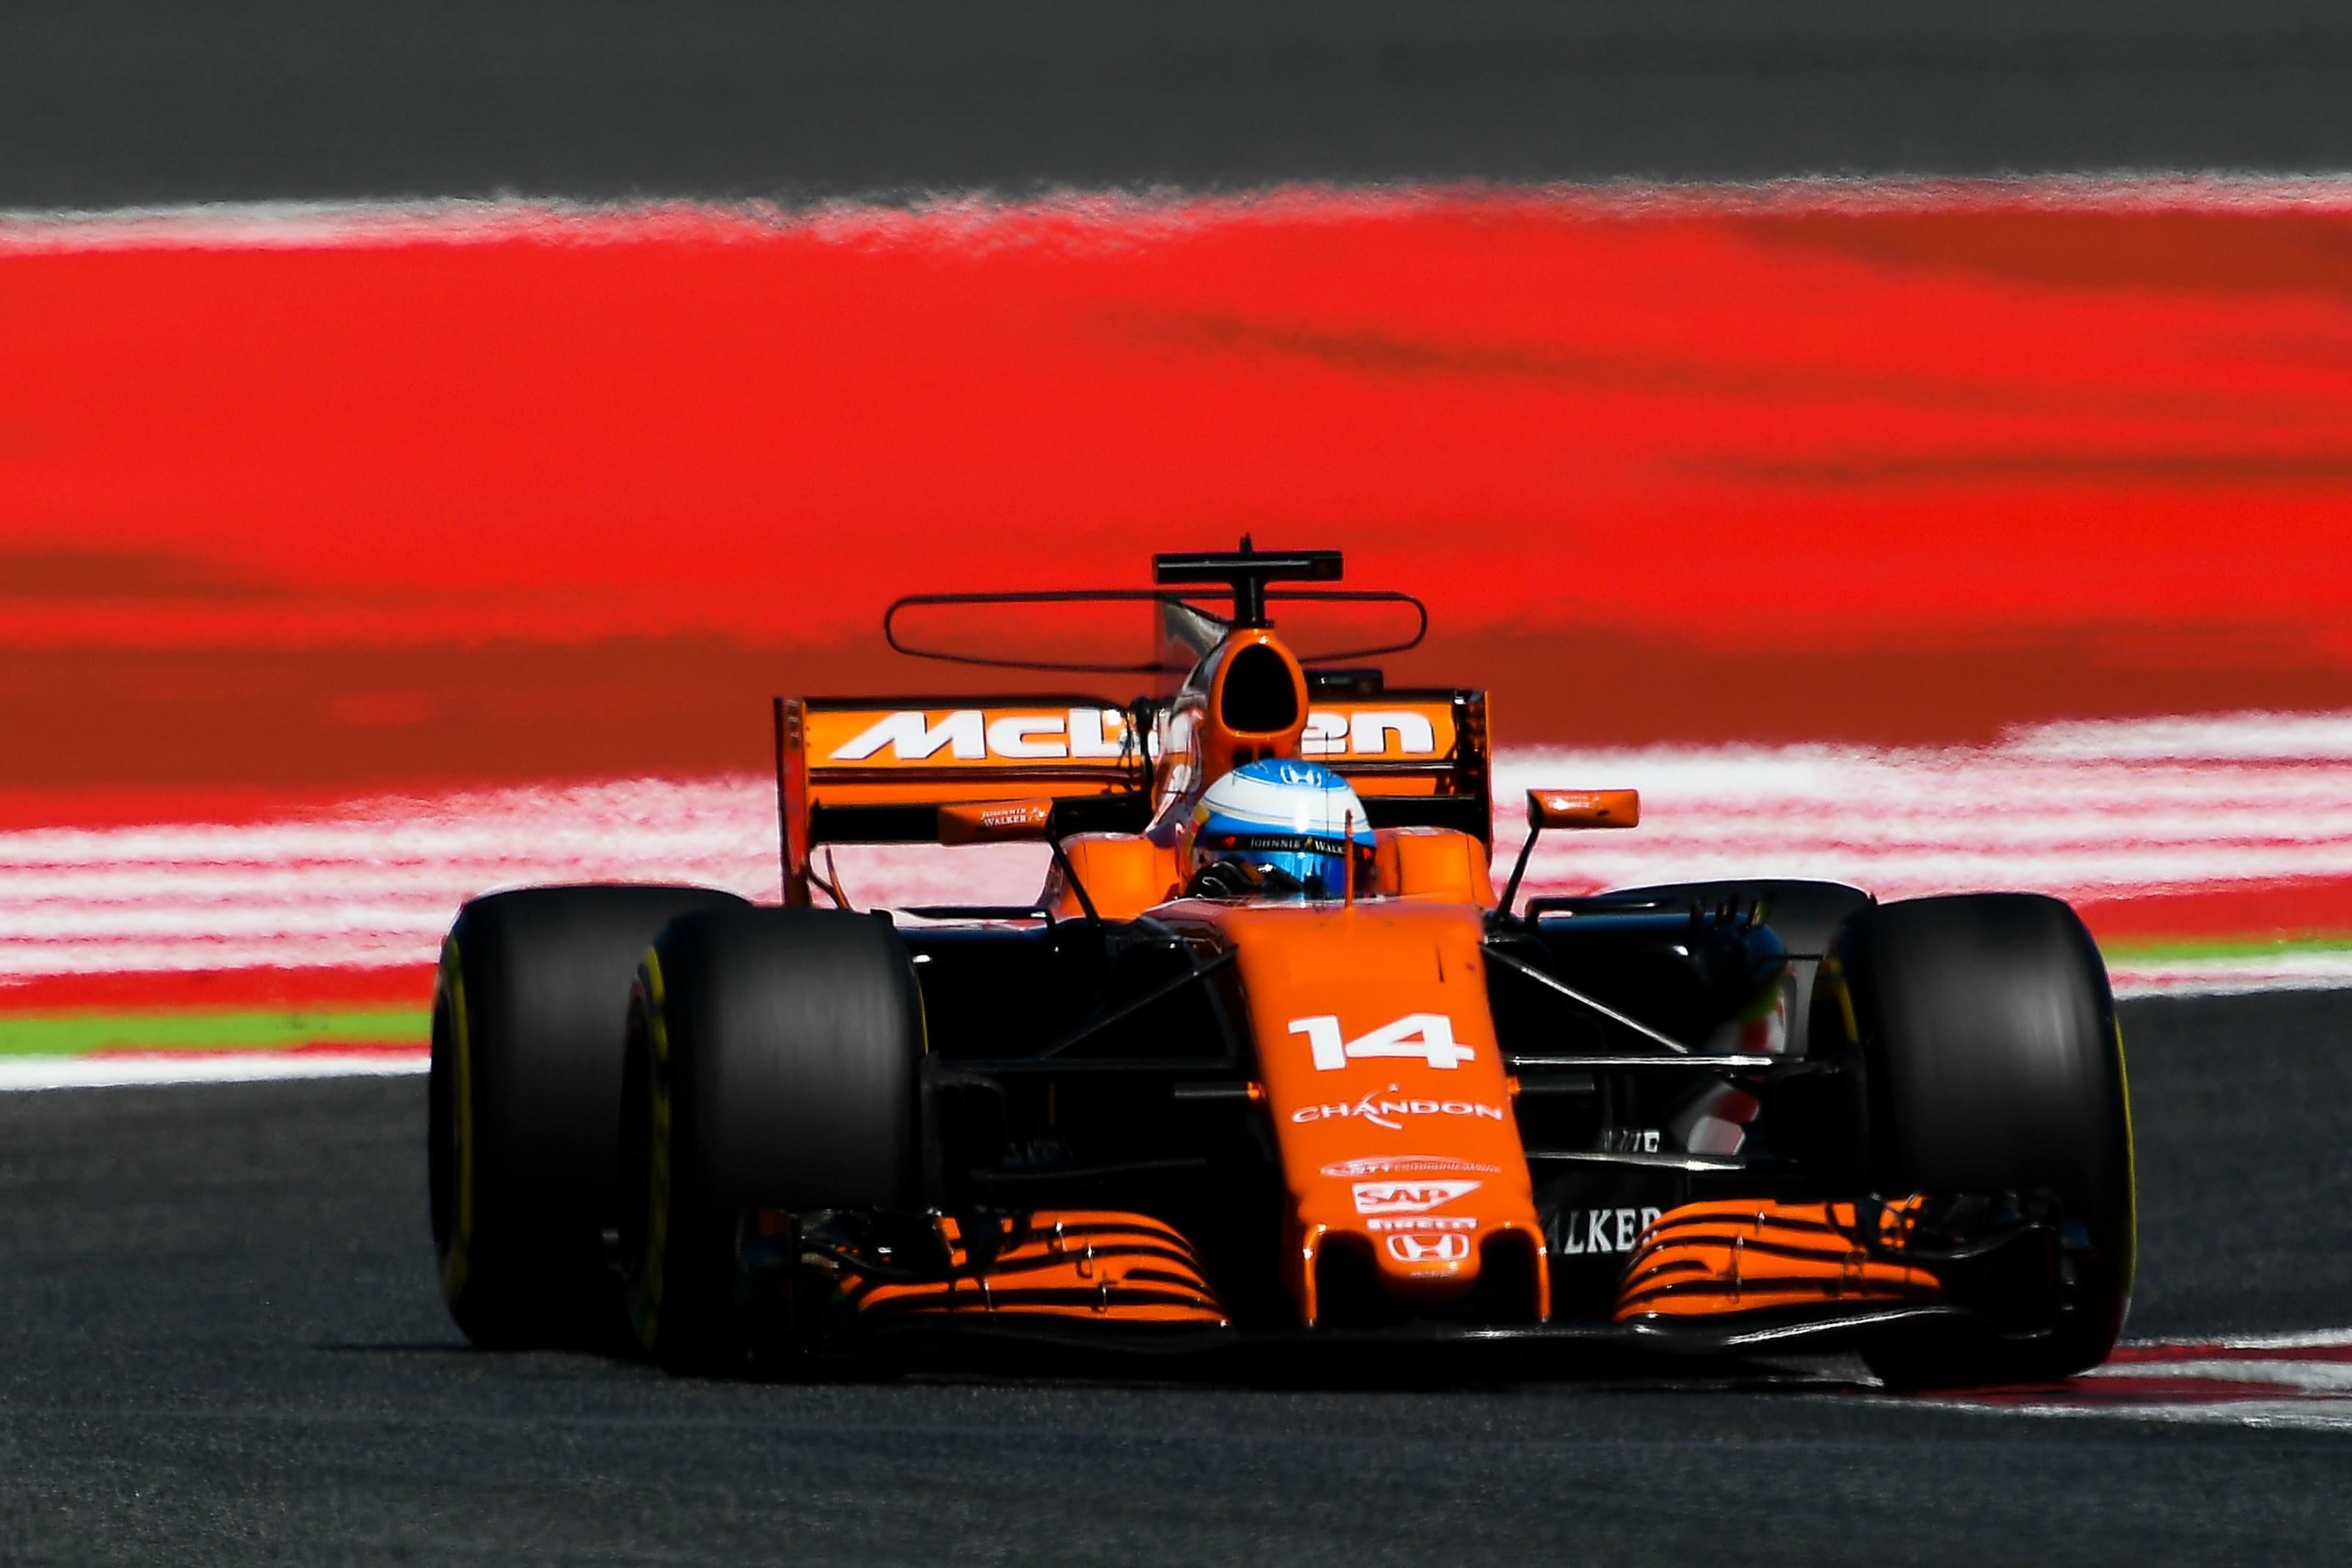 Fernando Alonso (McLaren) au Grand Prix d'Espagne 2017